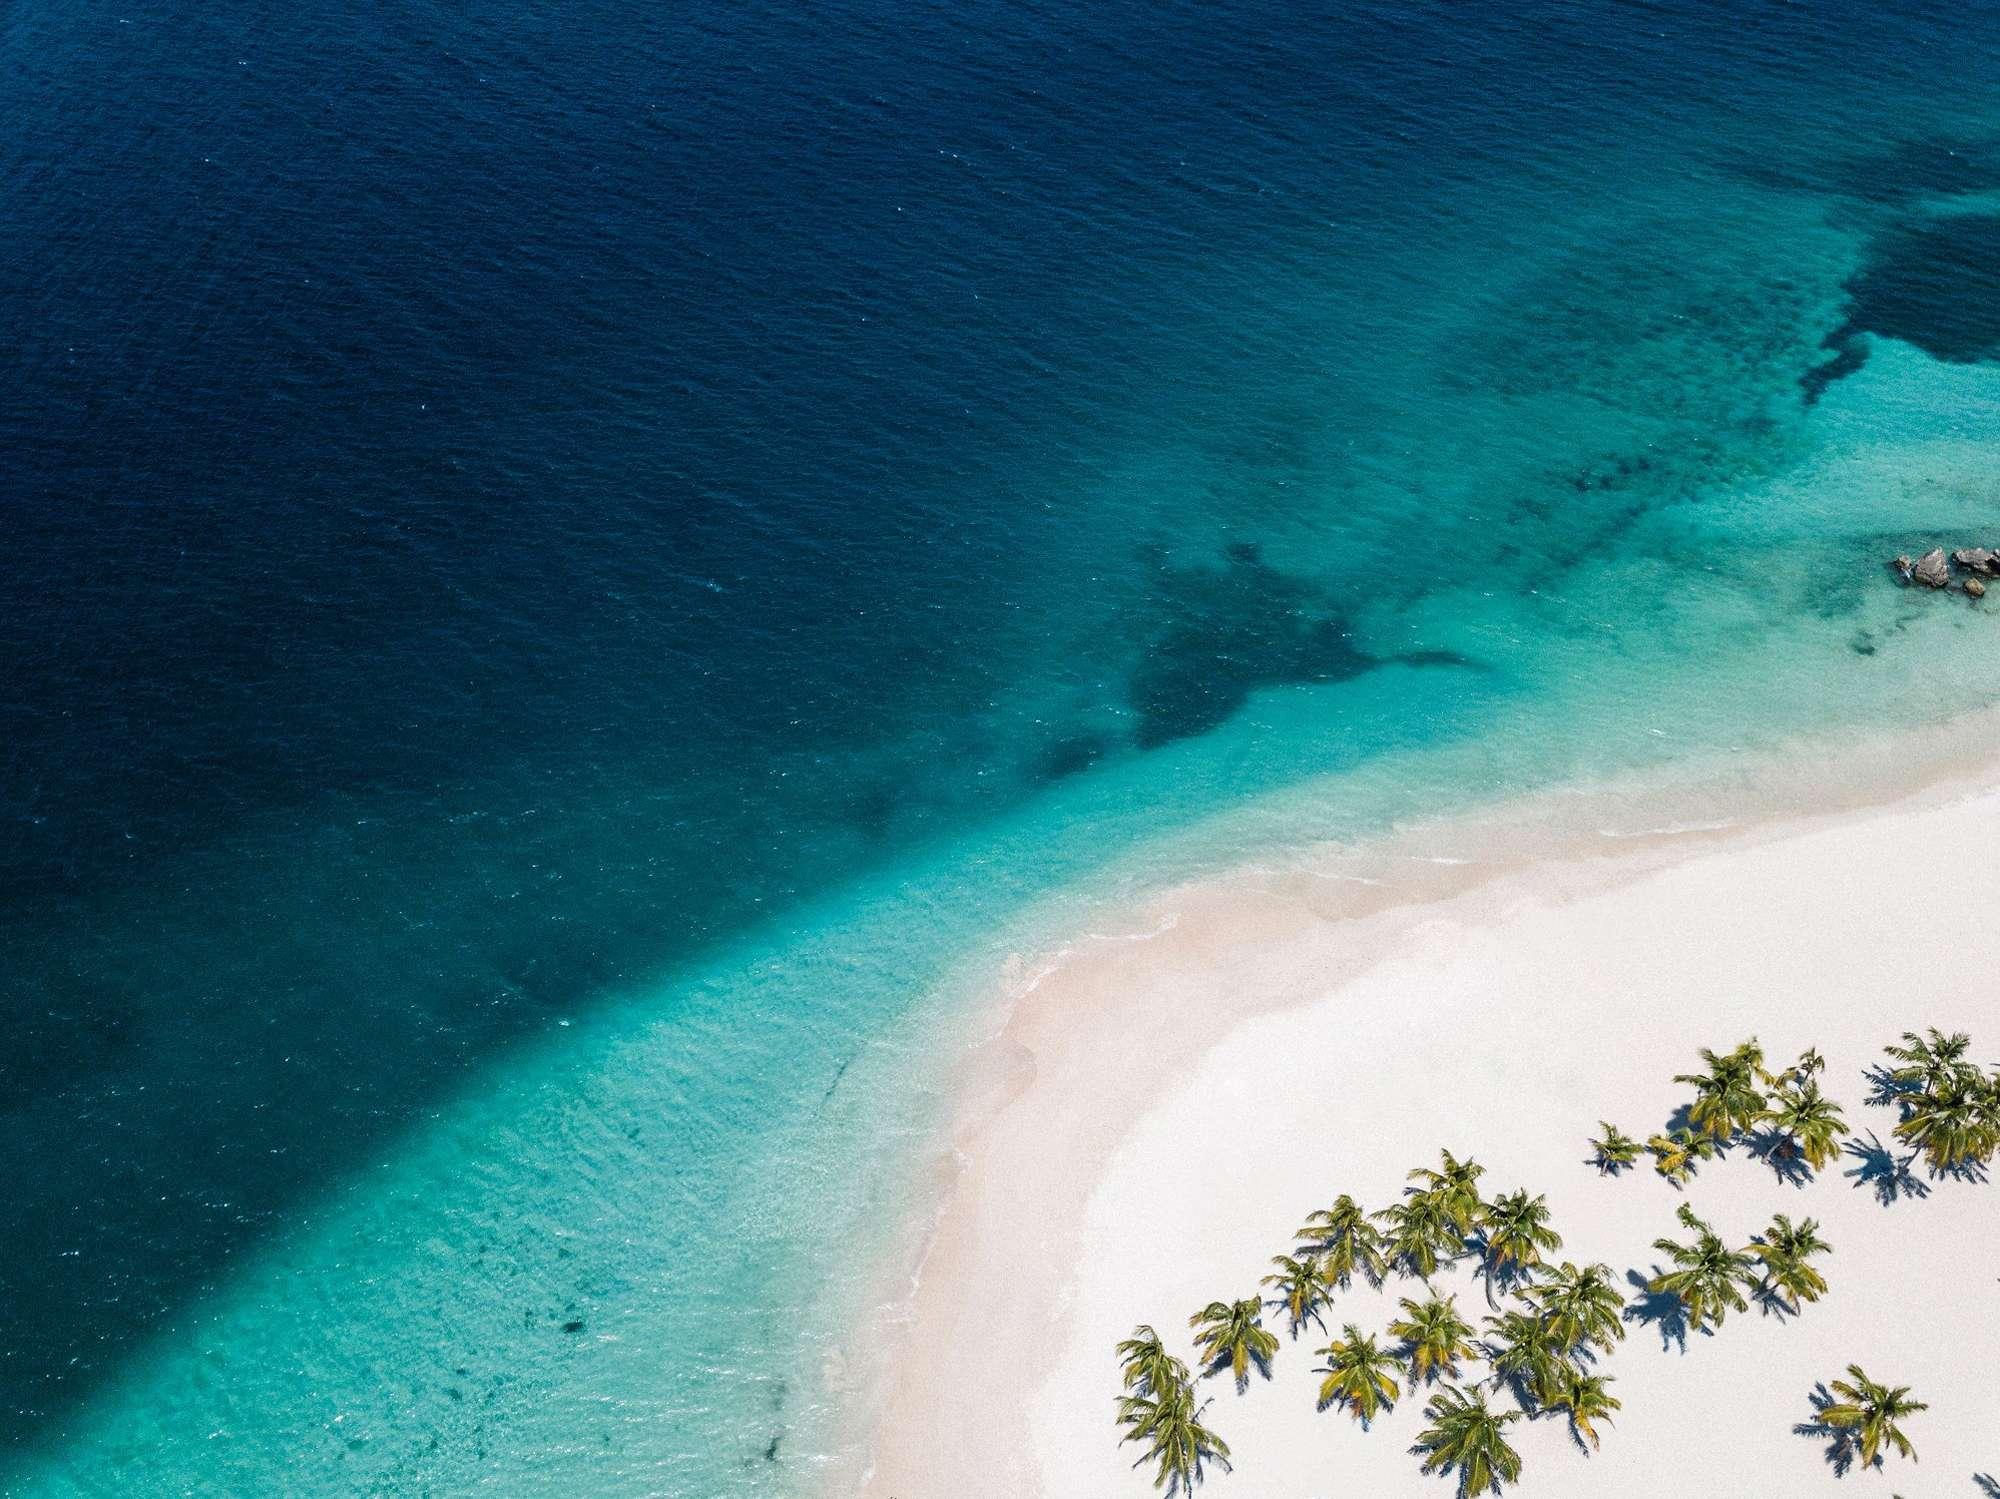 Фото рифового барьера